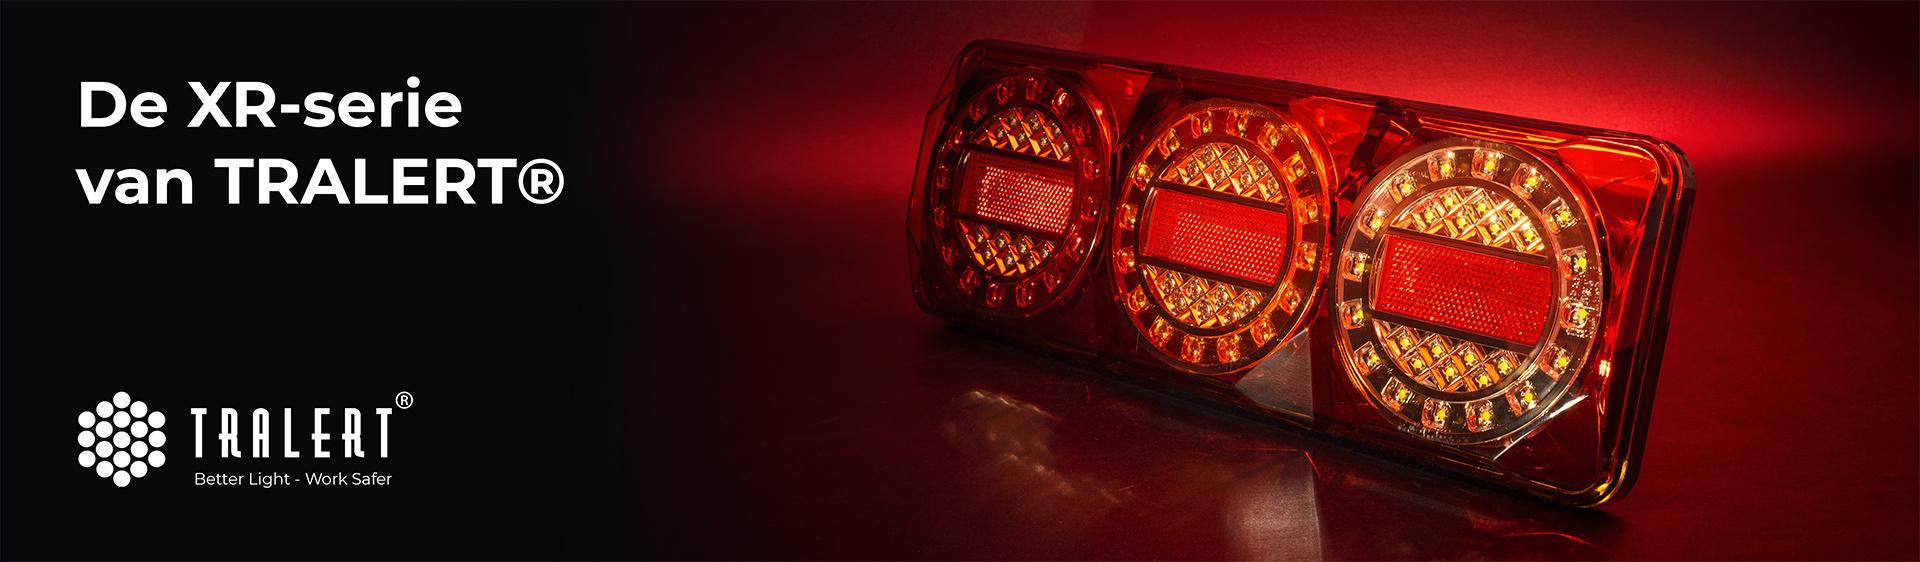 Tralert XR-serie LED achterlichten